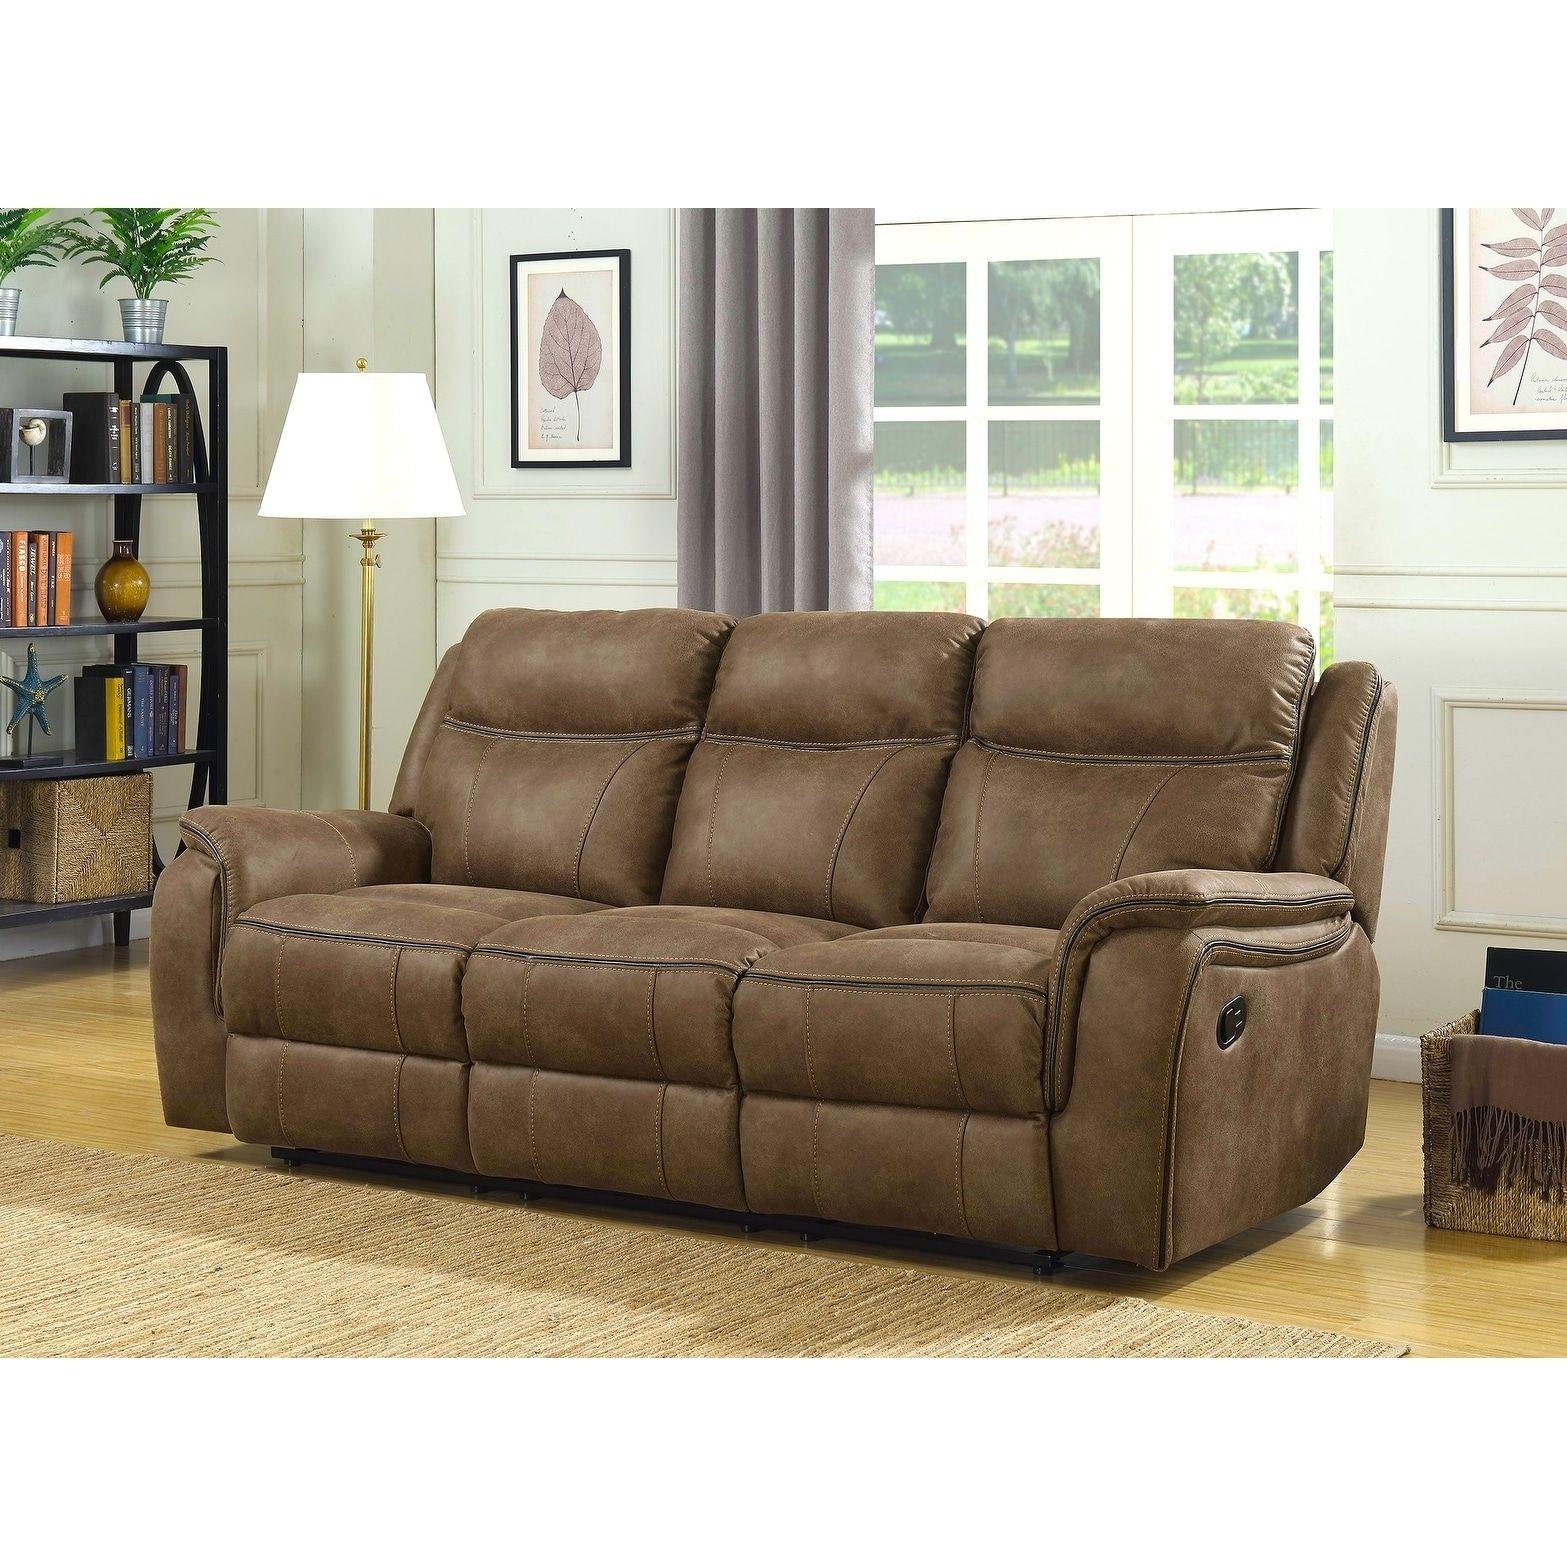 Astonishing Global Morrisofa Hudson Dual Lay Flat Reclining Sofa With Machost Co Dining Chair Design Ideas Machostcouk